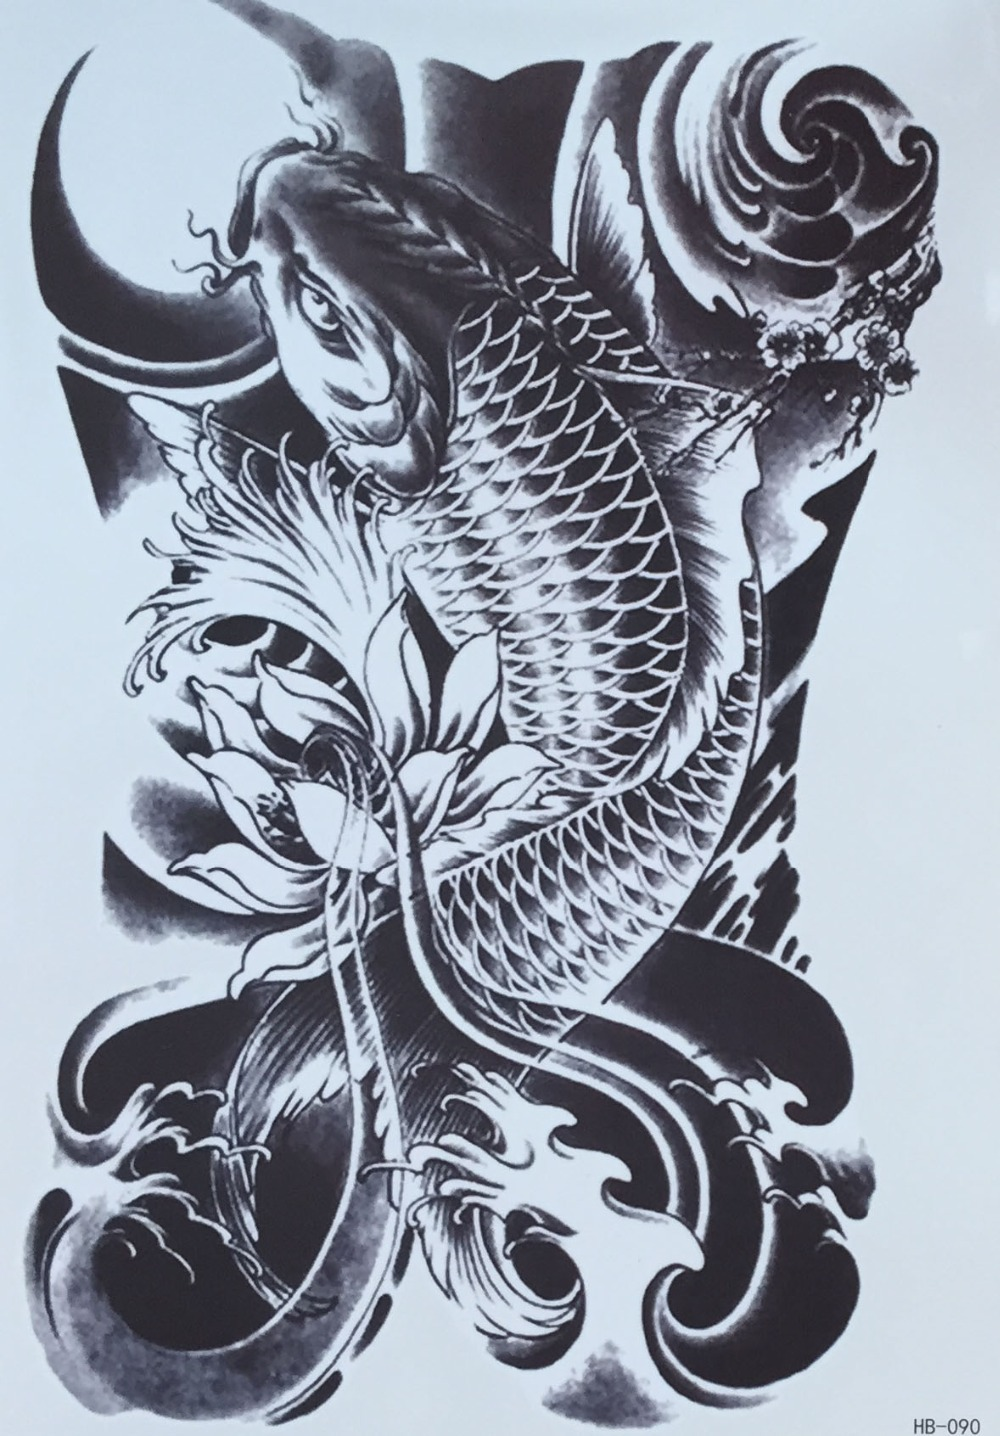 Worksheet. Brazo tatuajes temporales del tatuaje pegatinas peces grandes